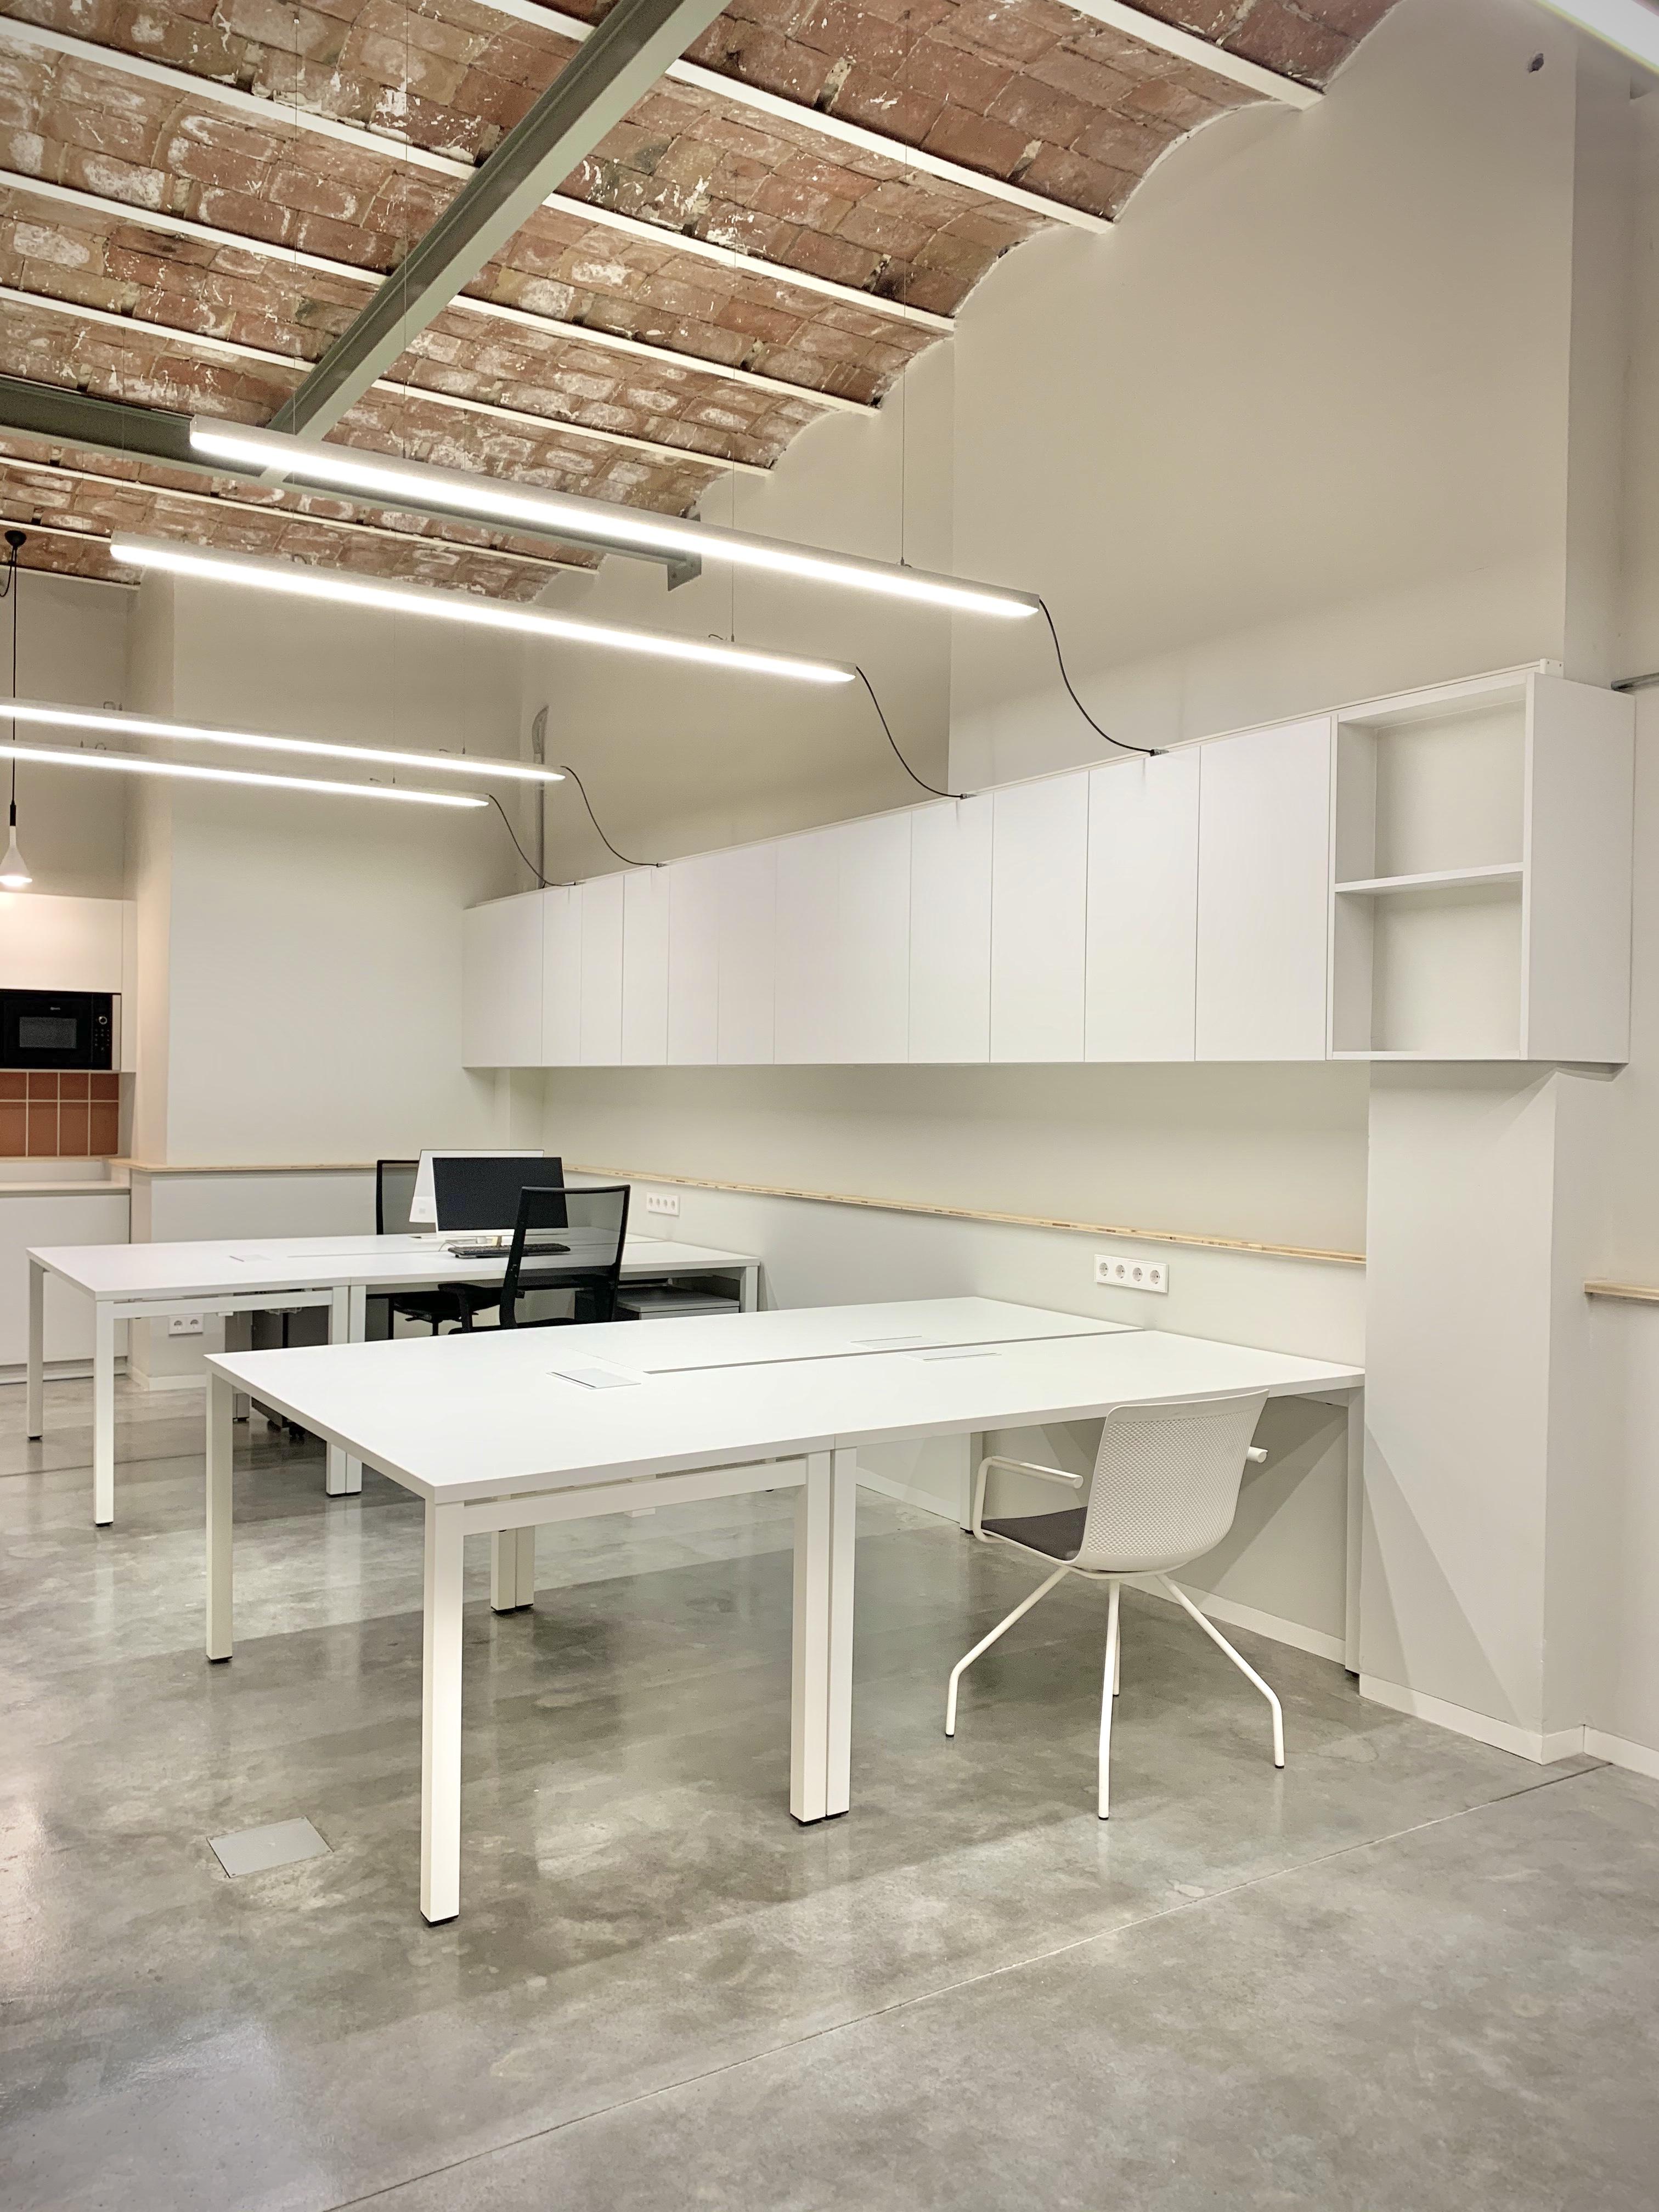 Arquivistes office 2